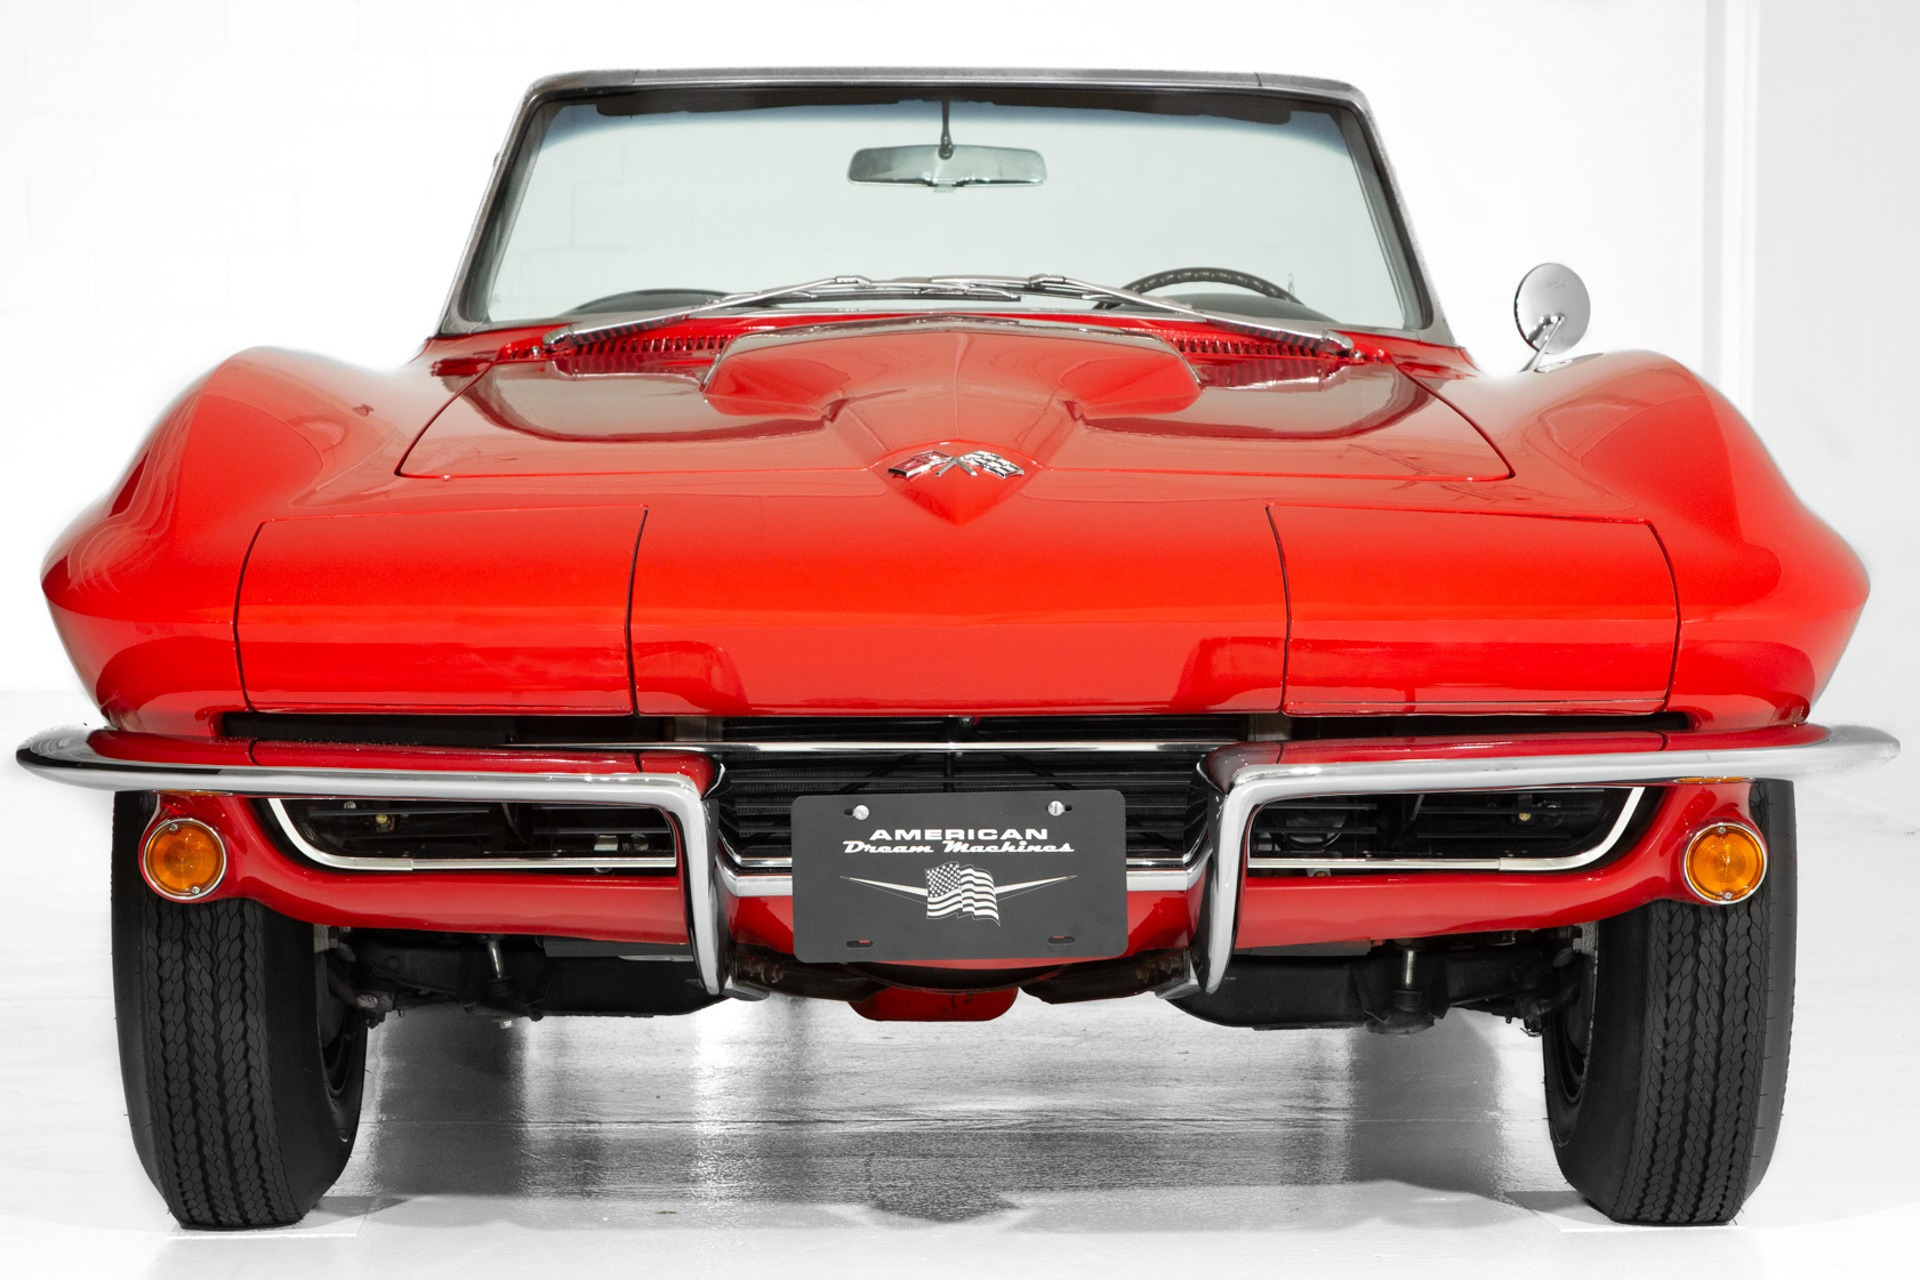 1965 Chevrolet Corvette Red 460hp Big Block -